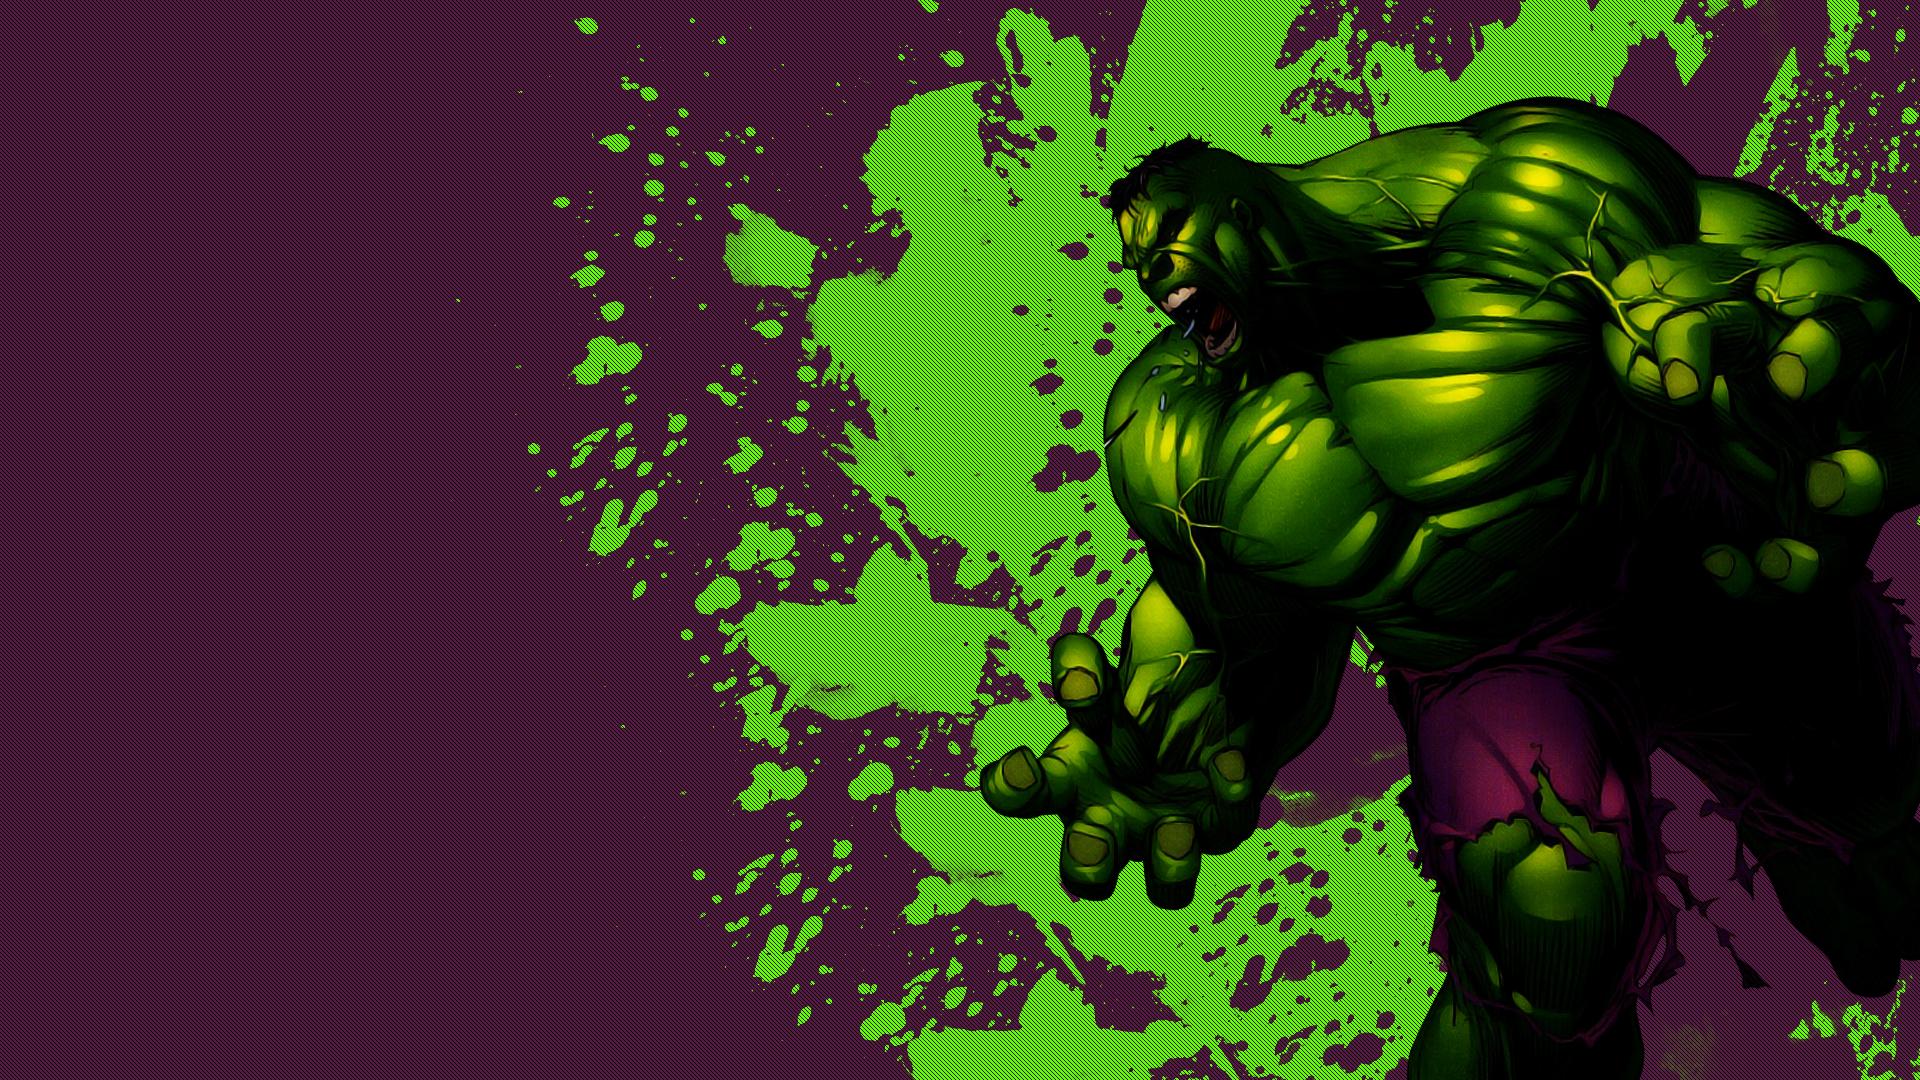 httpcartoondistrictcomincredible hulk wallpaper for desktop3 1920x1080